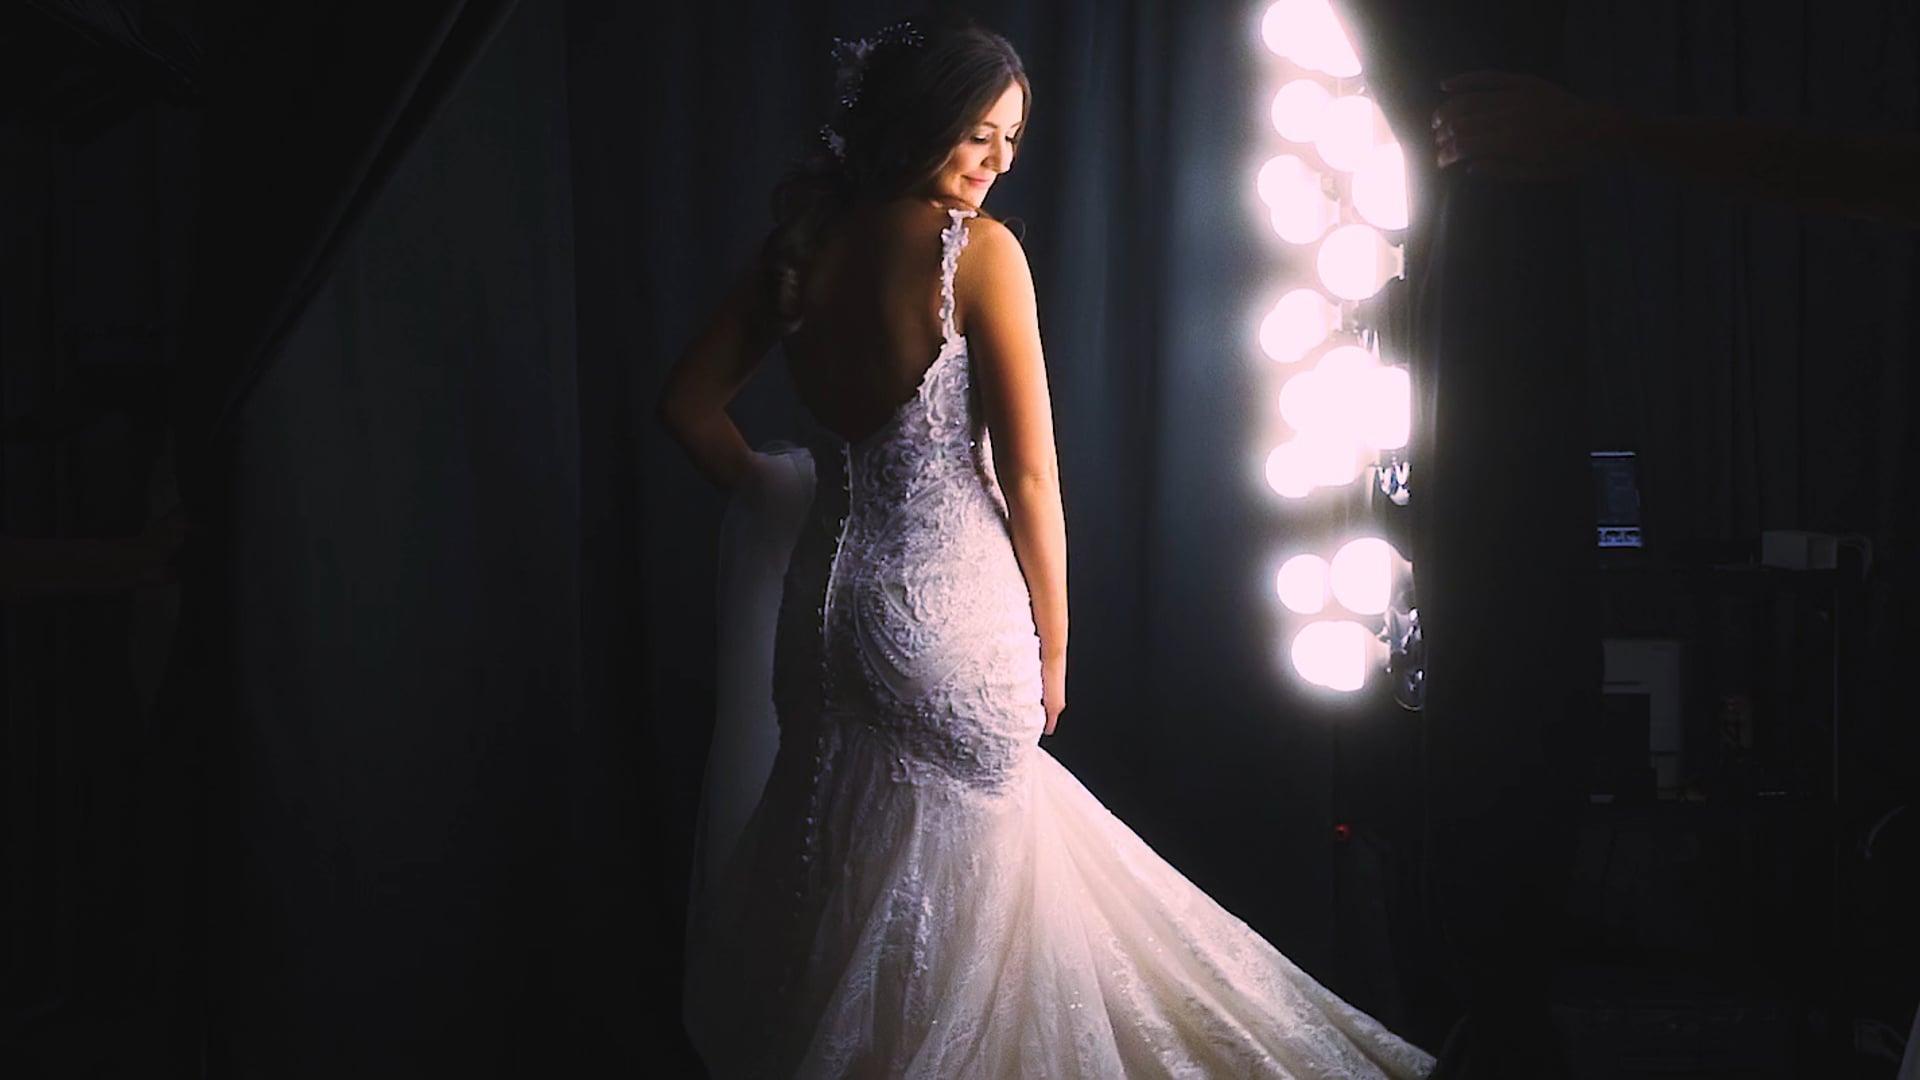 AVA LAURENNE BRIDE GRAND BALL (Extended Cut)